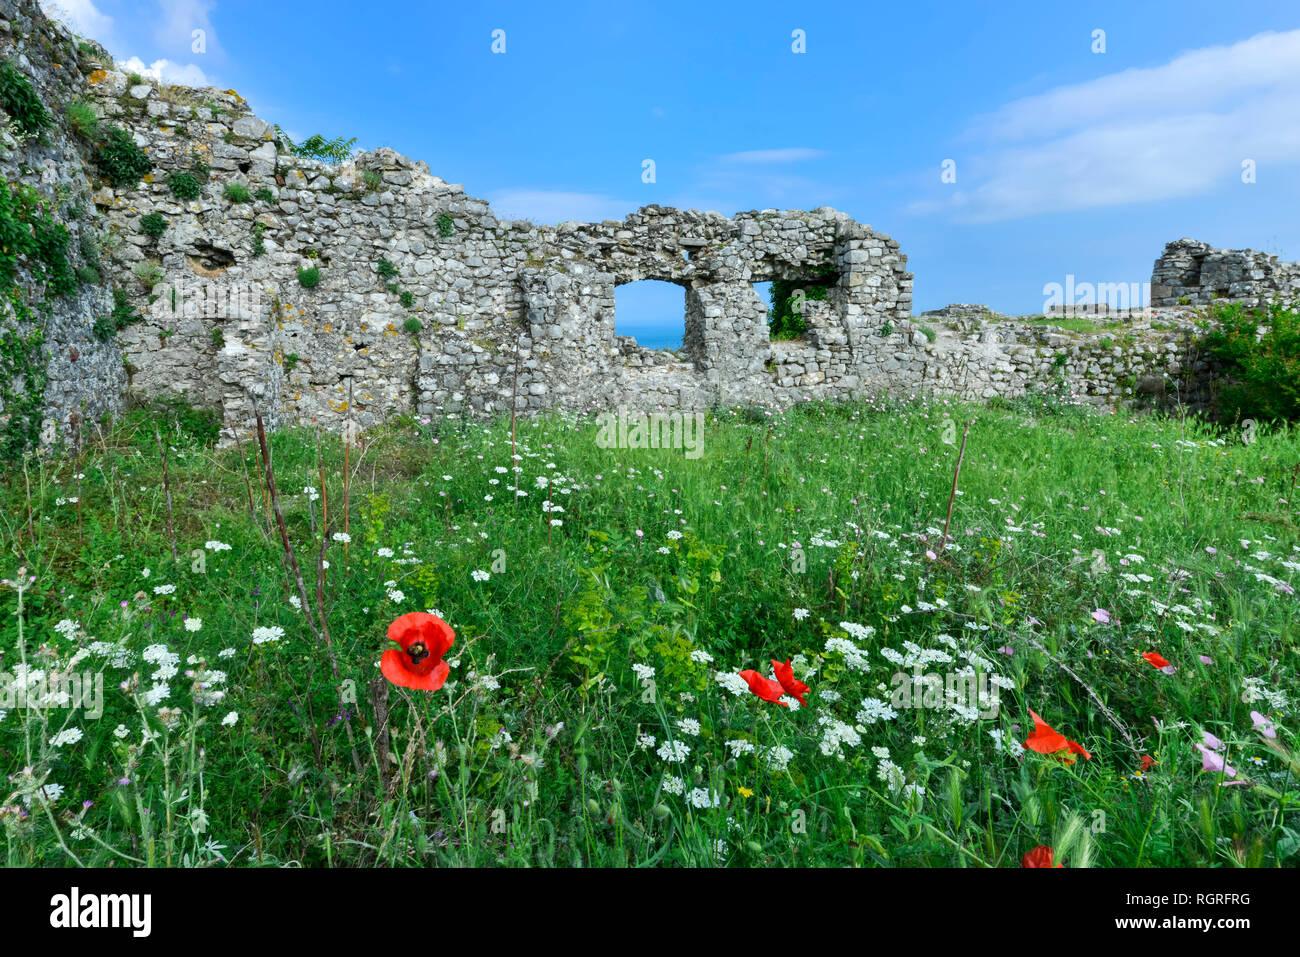 Rozafa castle, Ramparts and Poppies, Shkodra, Albania - Stock Image